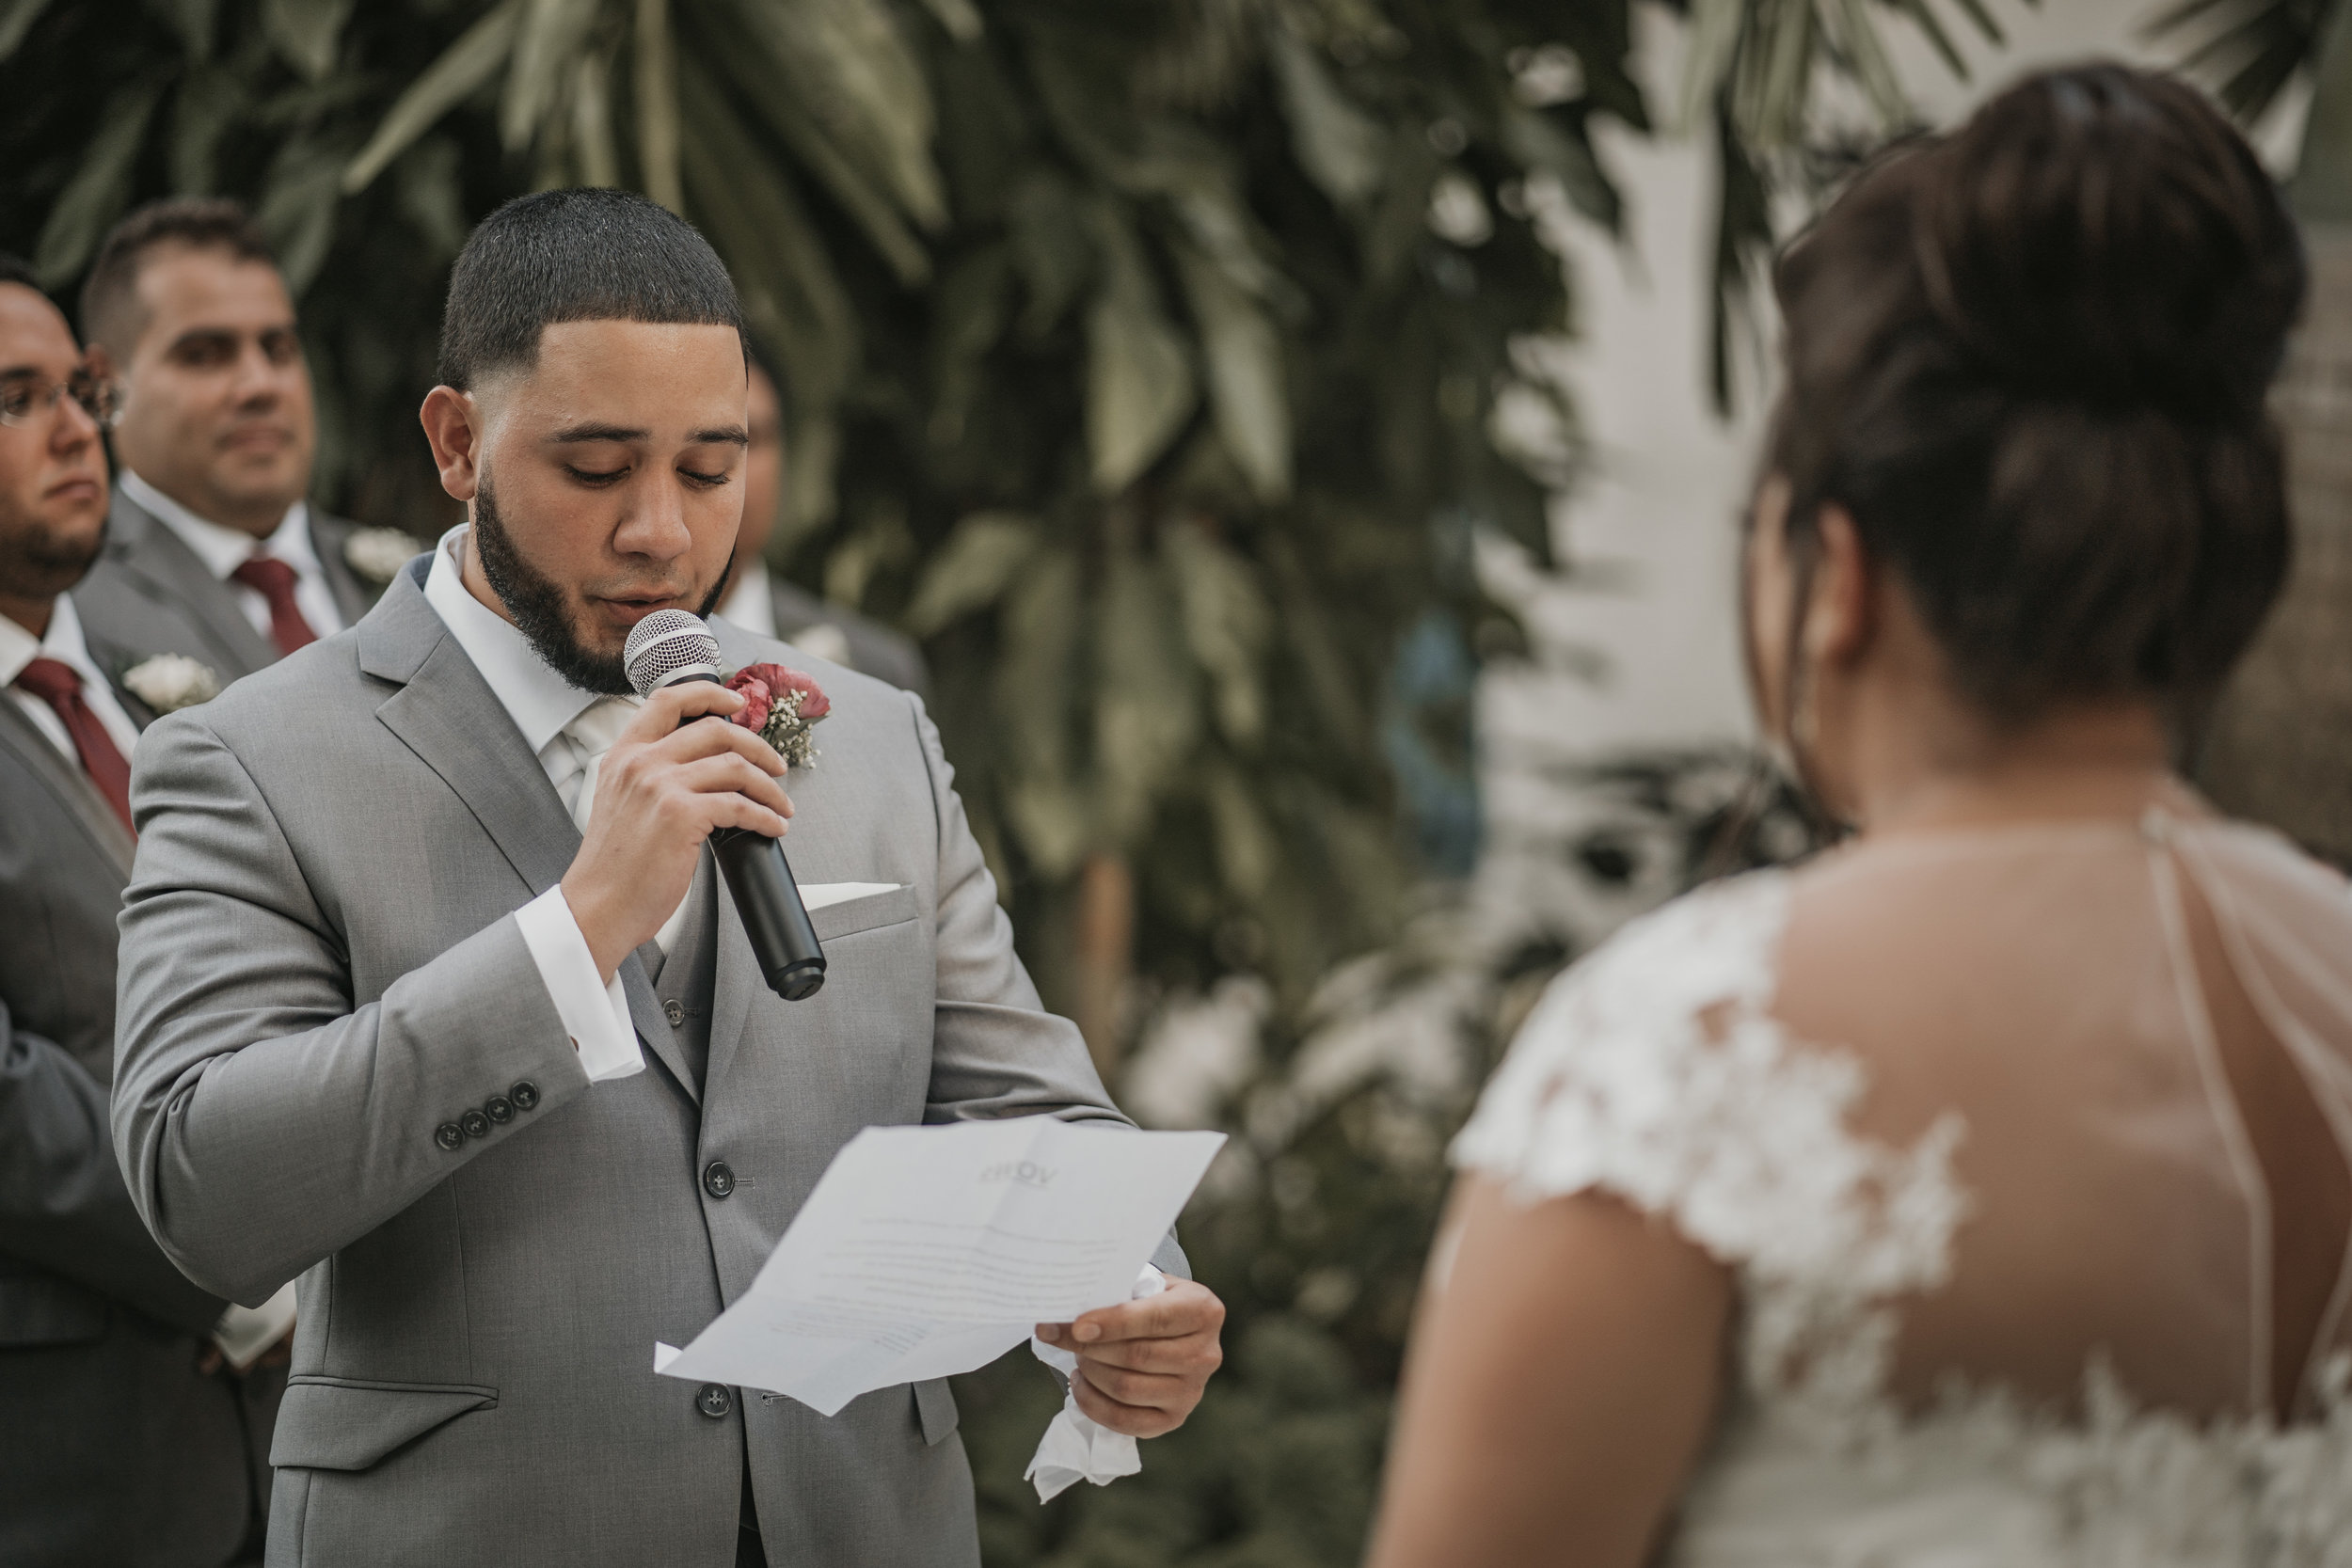 271MICHI&GABEWEDDINGDAY(WeddingFinal).jpg